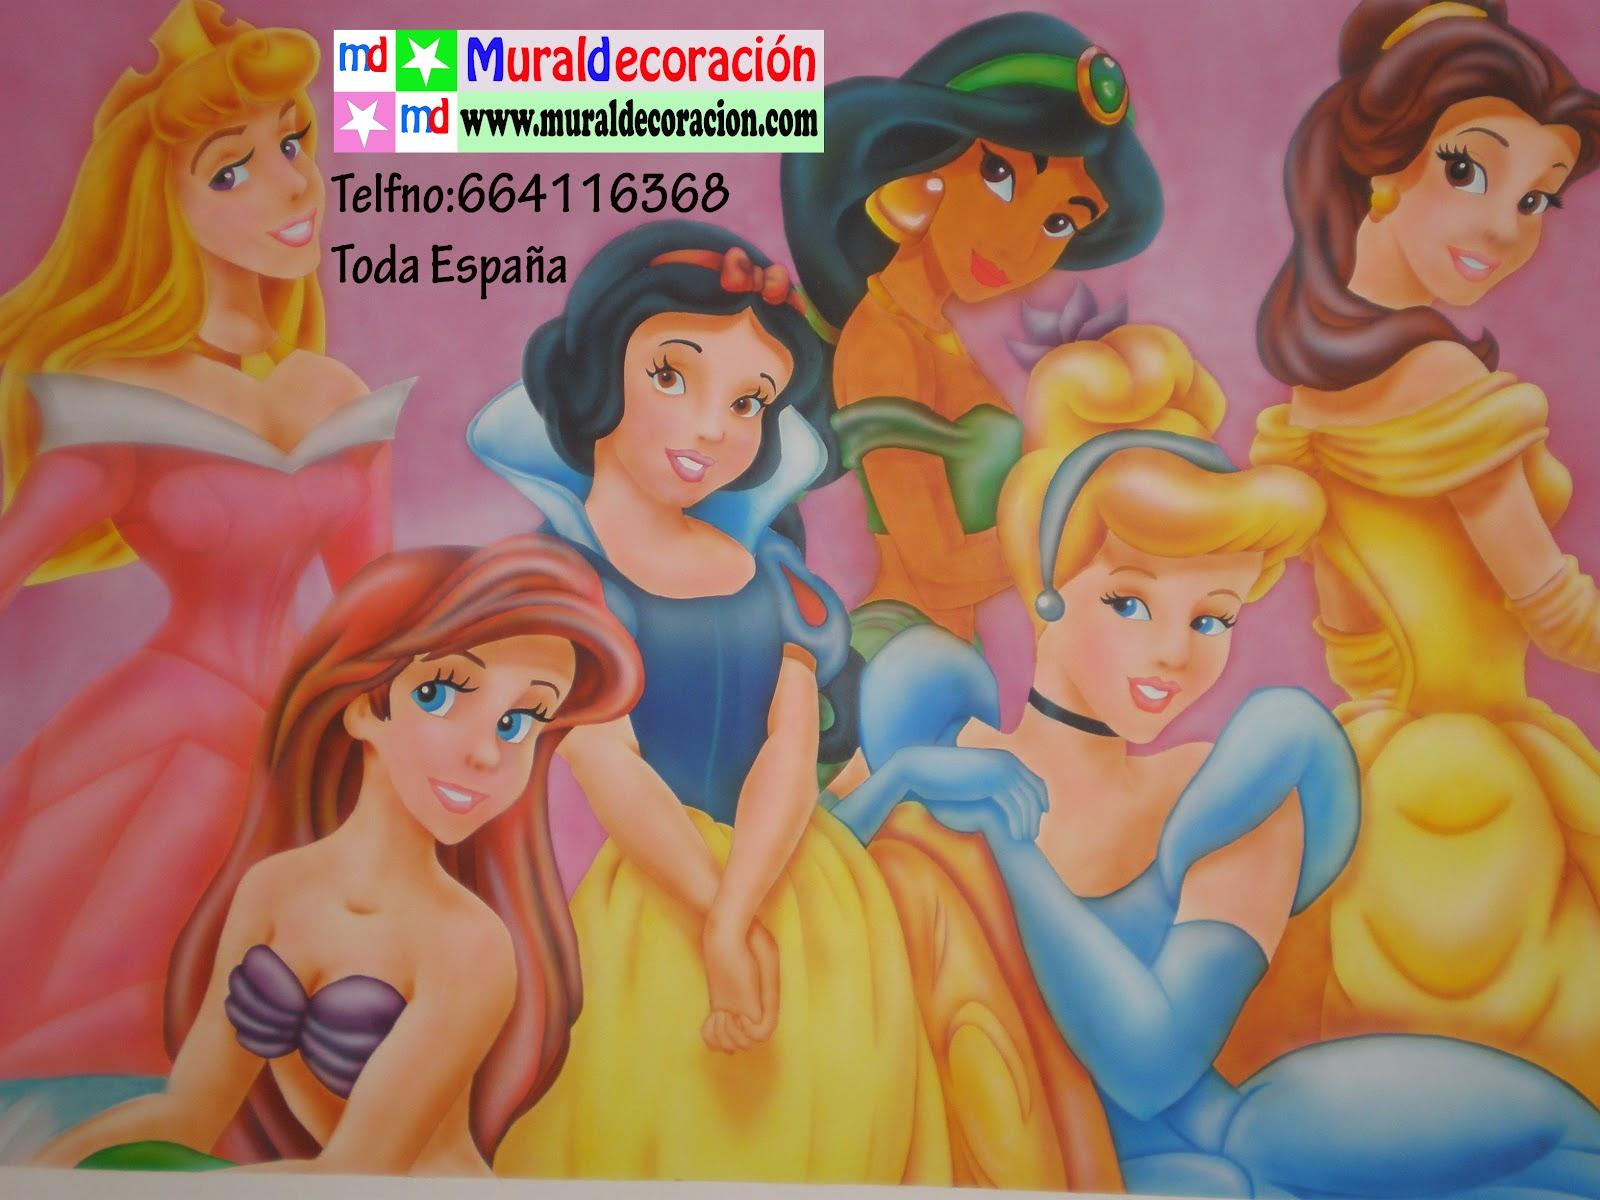 http://1.bp.blogspot.com/-NGPQhsNxso4/UD4sXQGKQTI/AAAAAAAABjI/OLm7OKNjC68/s1600/Dormitorio_Mural_Infantil_Princesas_Disney.jpg